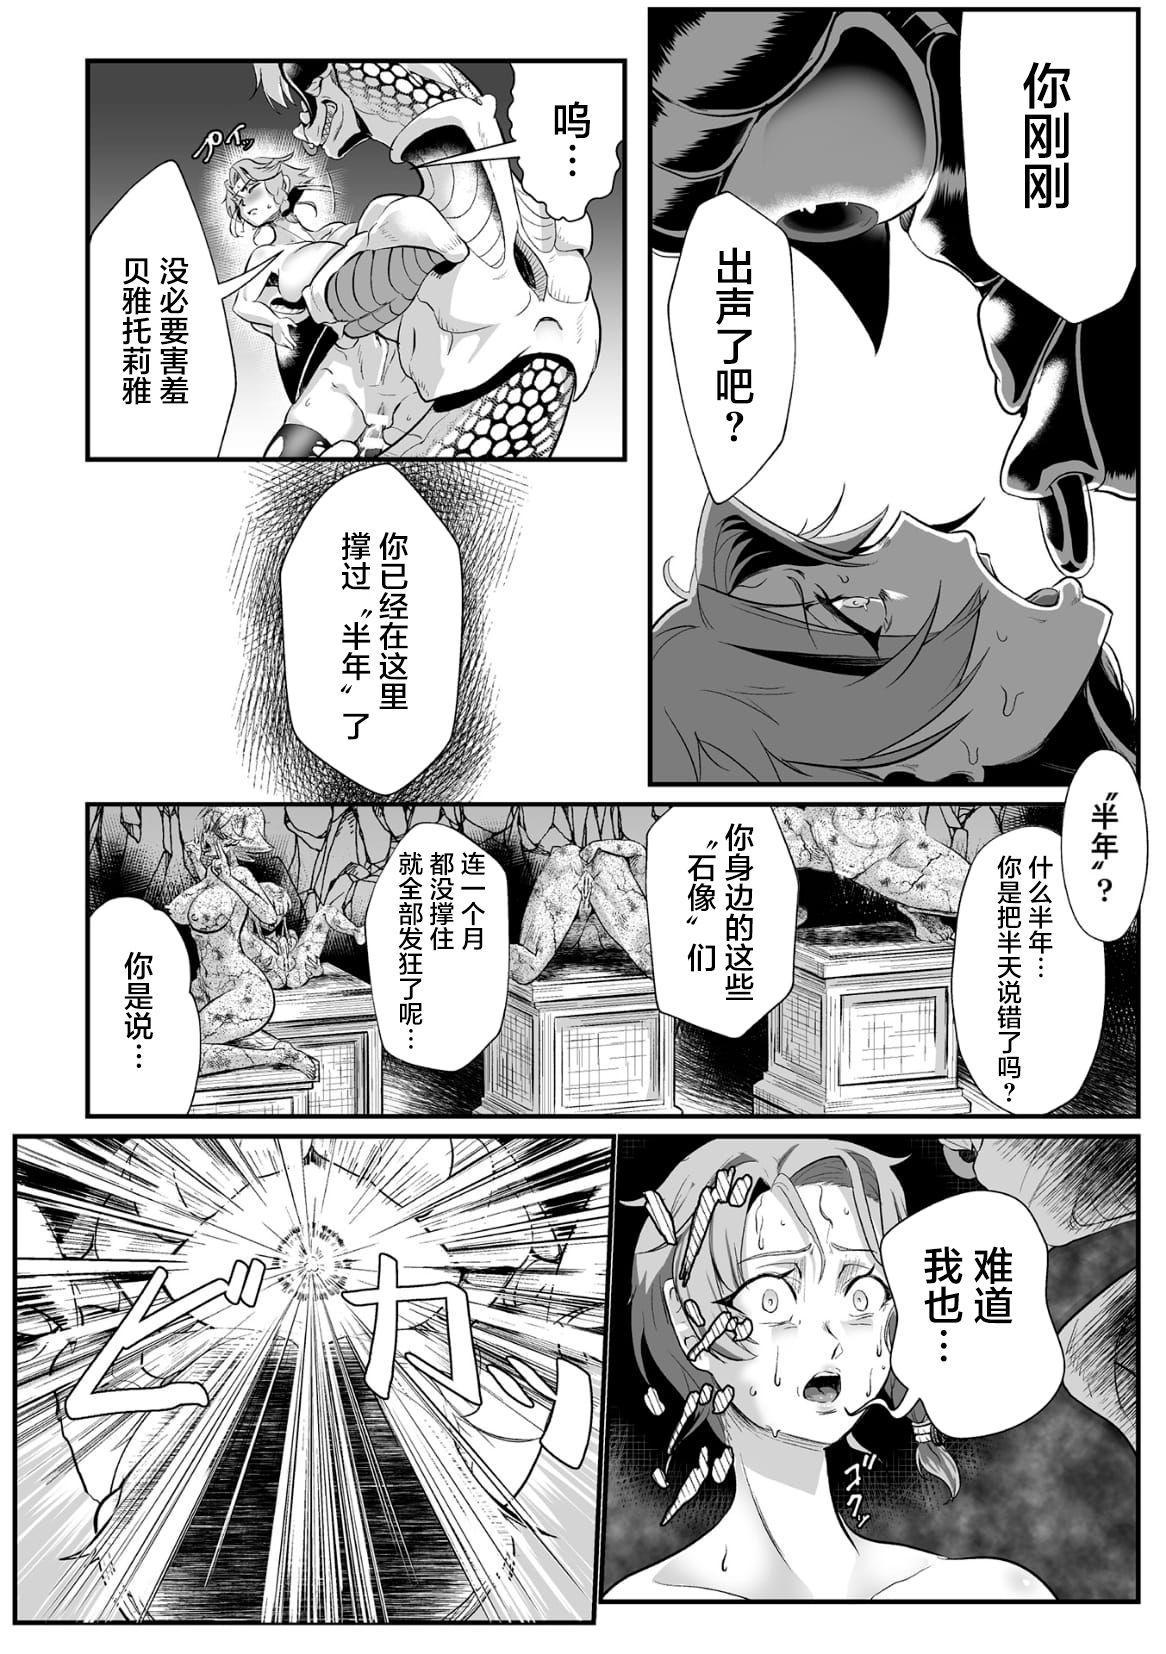 [Mou] Sekkan Fuuin ~Enbi na Sekizou ni Otosareshi Yuusha Ichizoku~ Ch. 1 [Chinese] [不咕鸟汉化组] 15